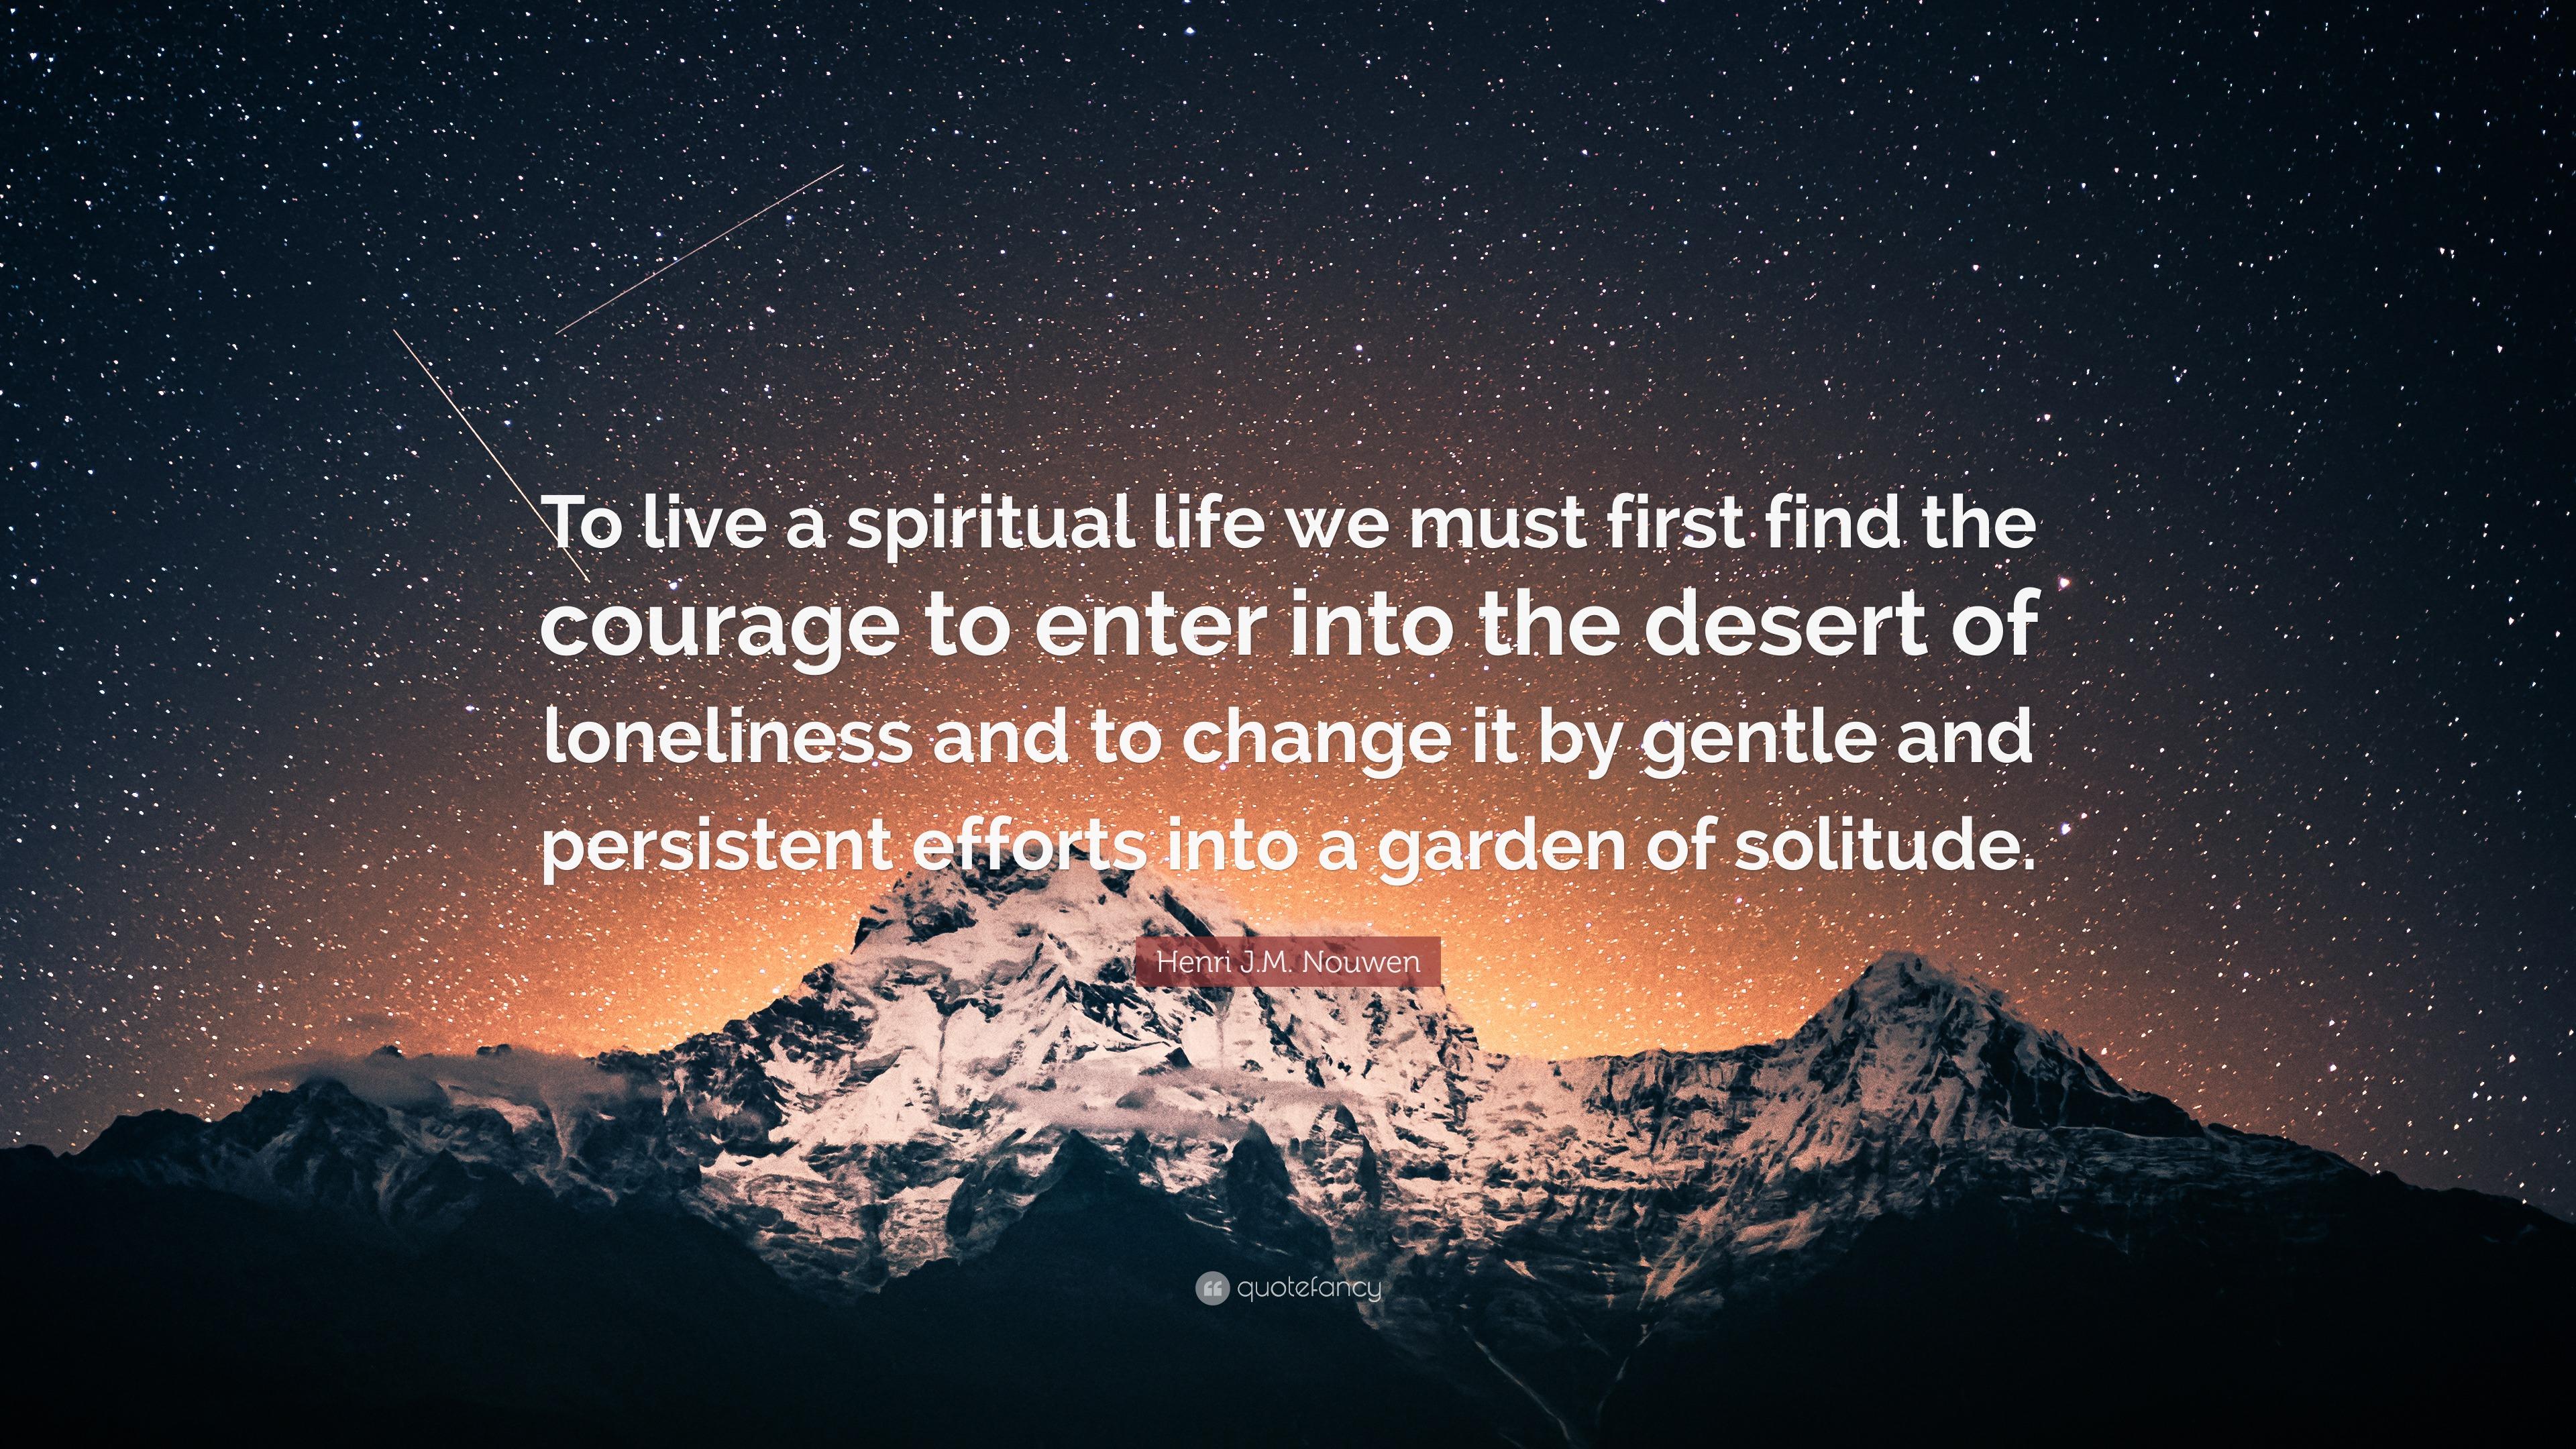 Henri jm nouwen quote to live a spiritual life we must first henri jm nouwen quote to live a spiritual life we must first find the altavistaventures Images